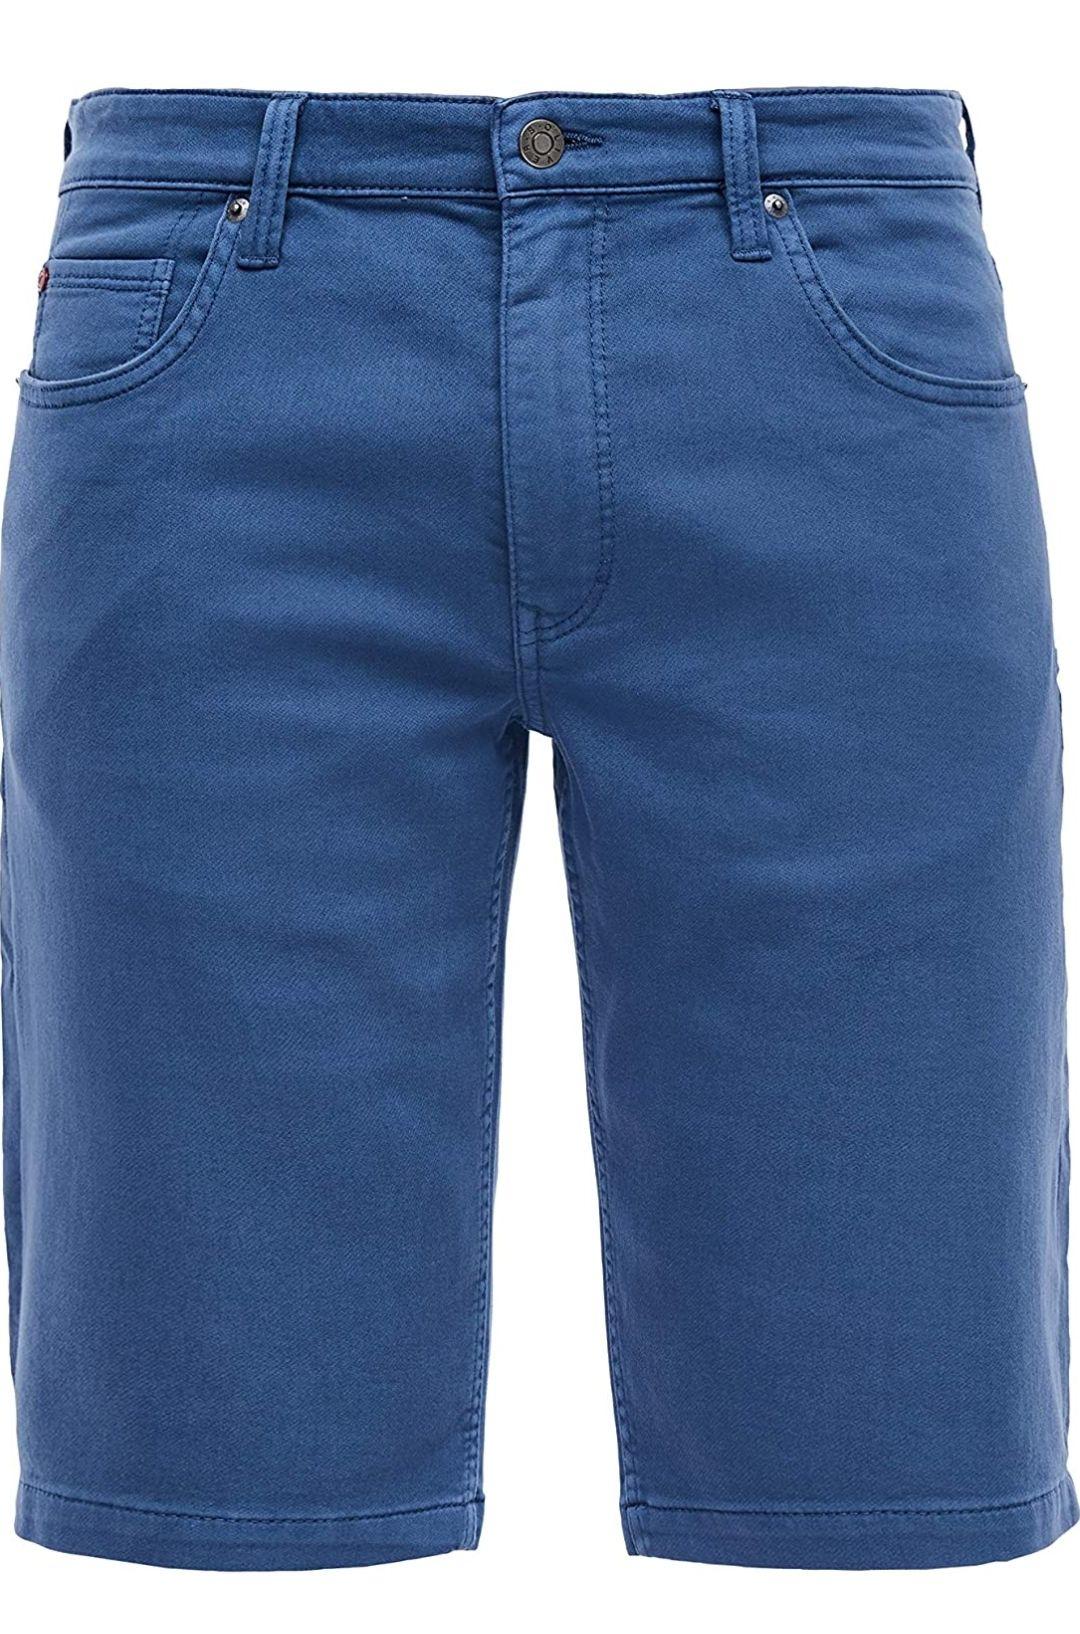 s.Oliver Herren Regular Fit Bermuda Shorts bei Amazon Prime